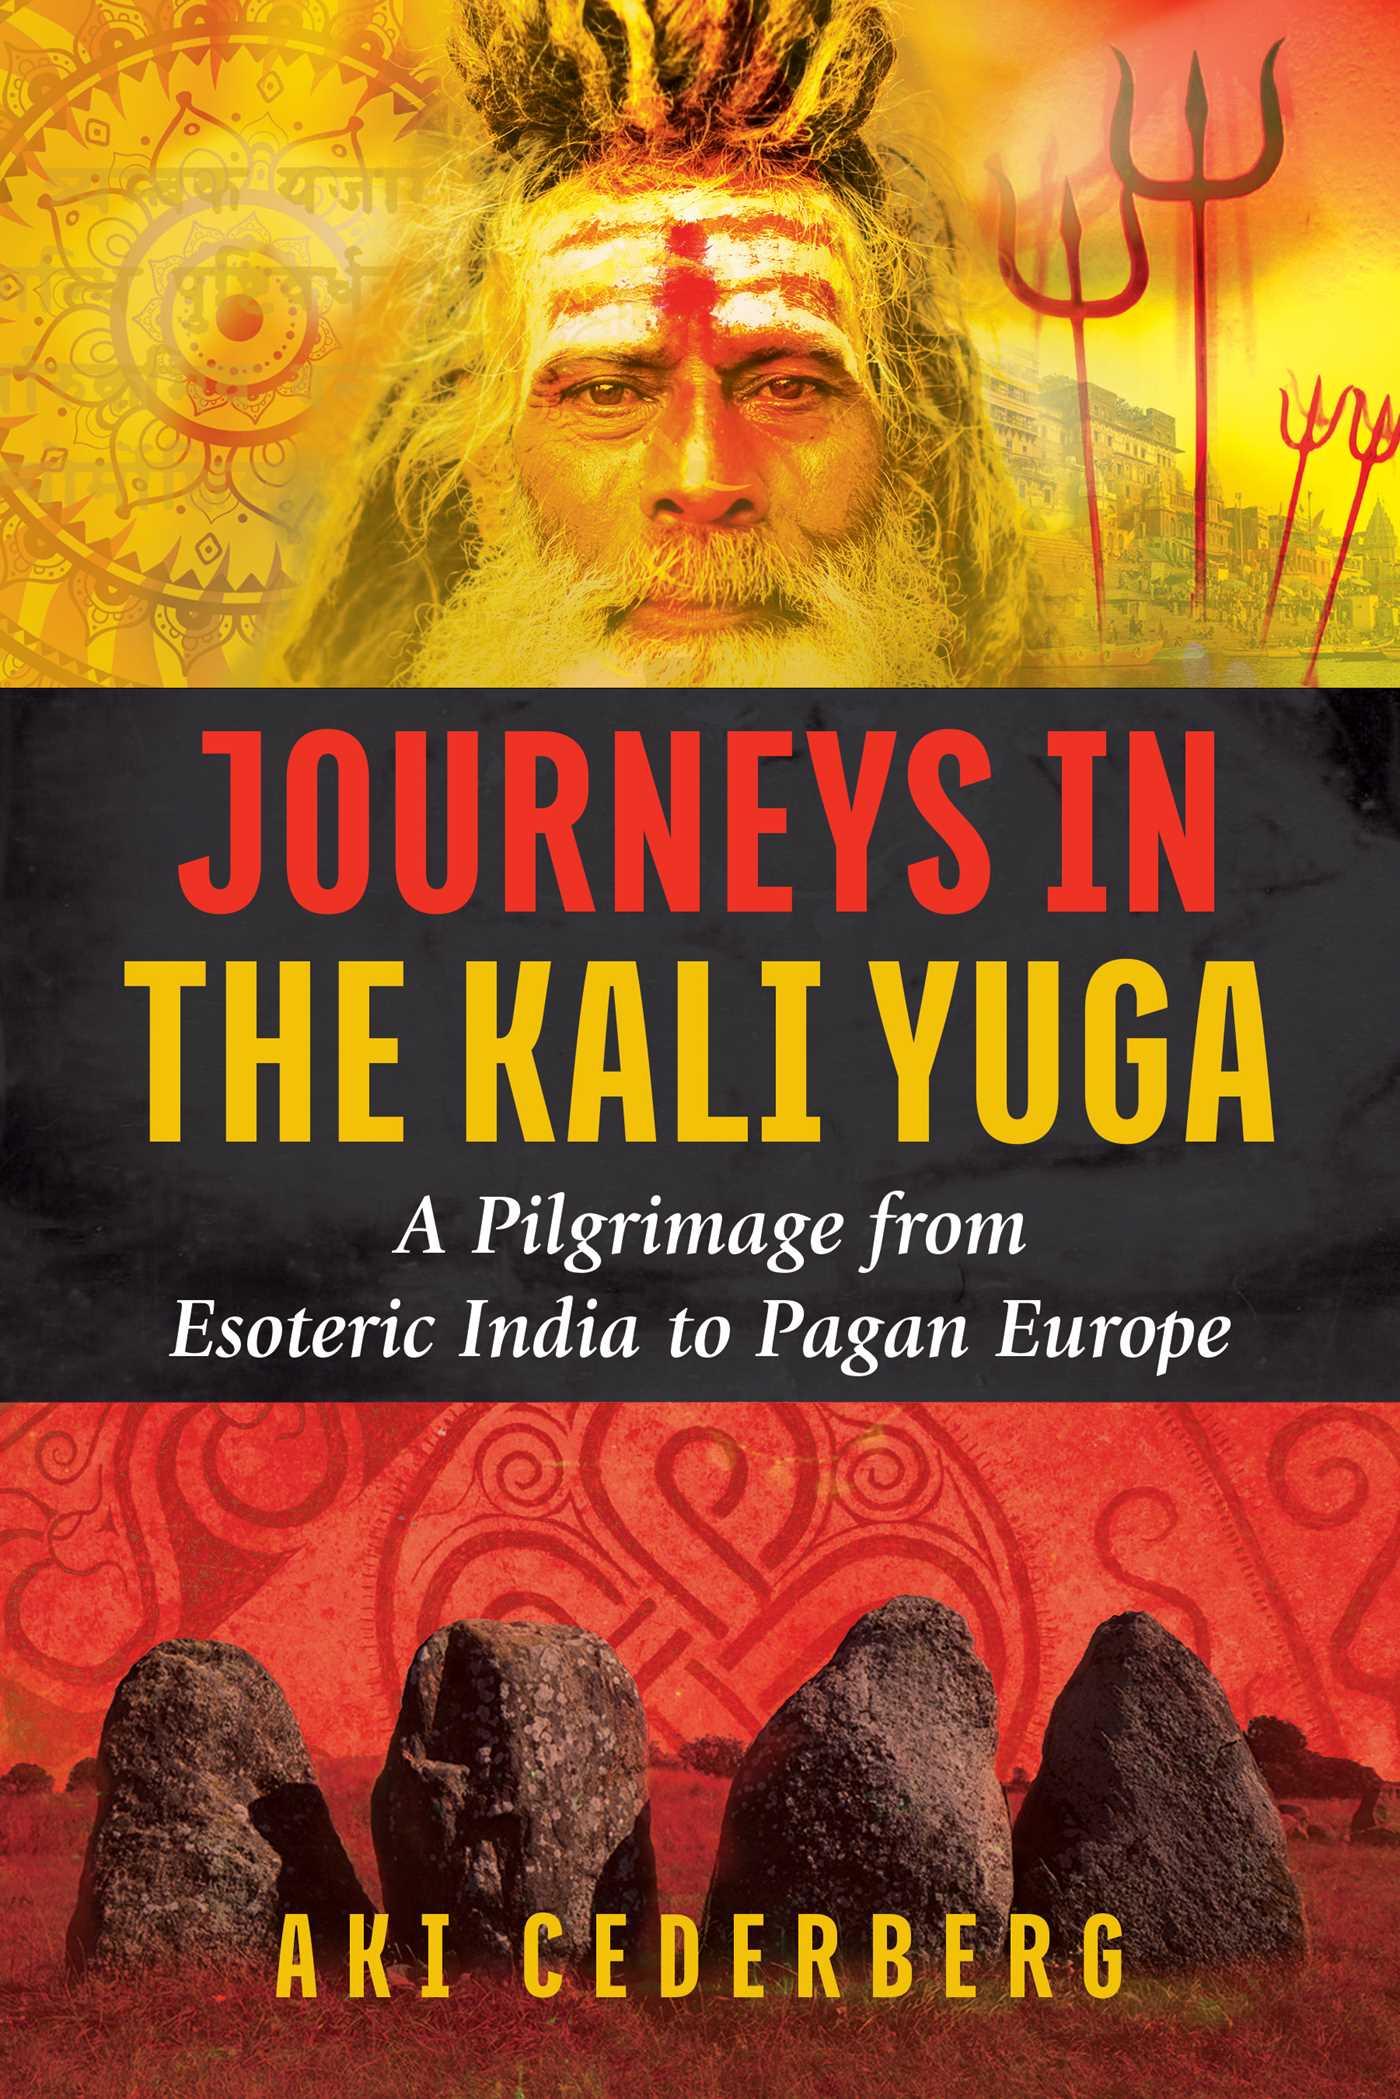 Journeys in the kali yuga 9781620556795 hr